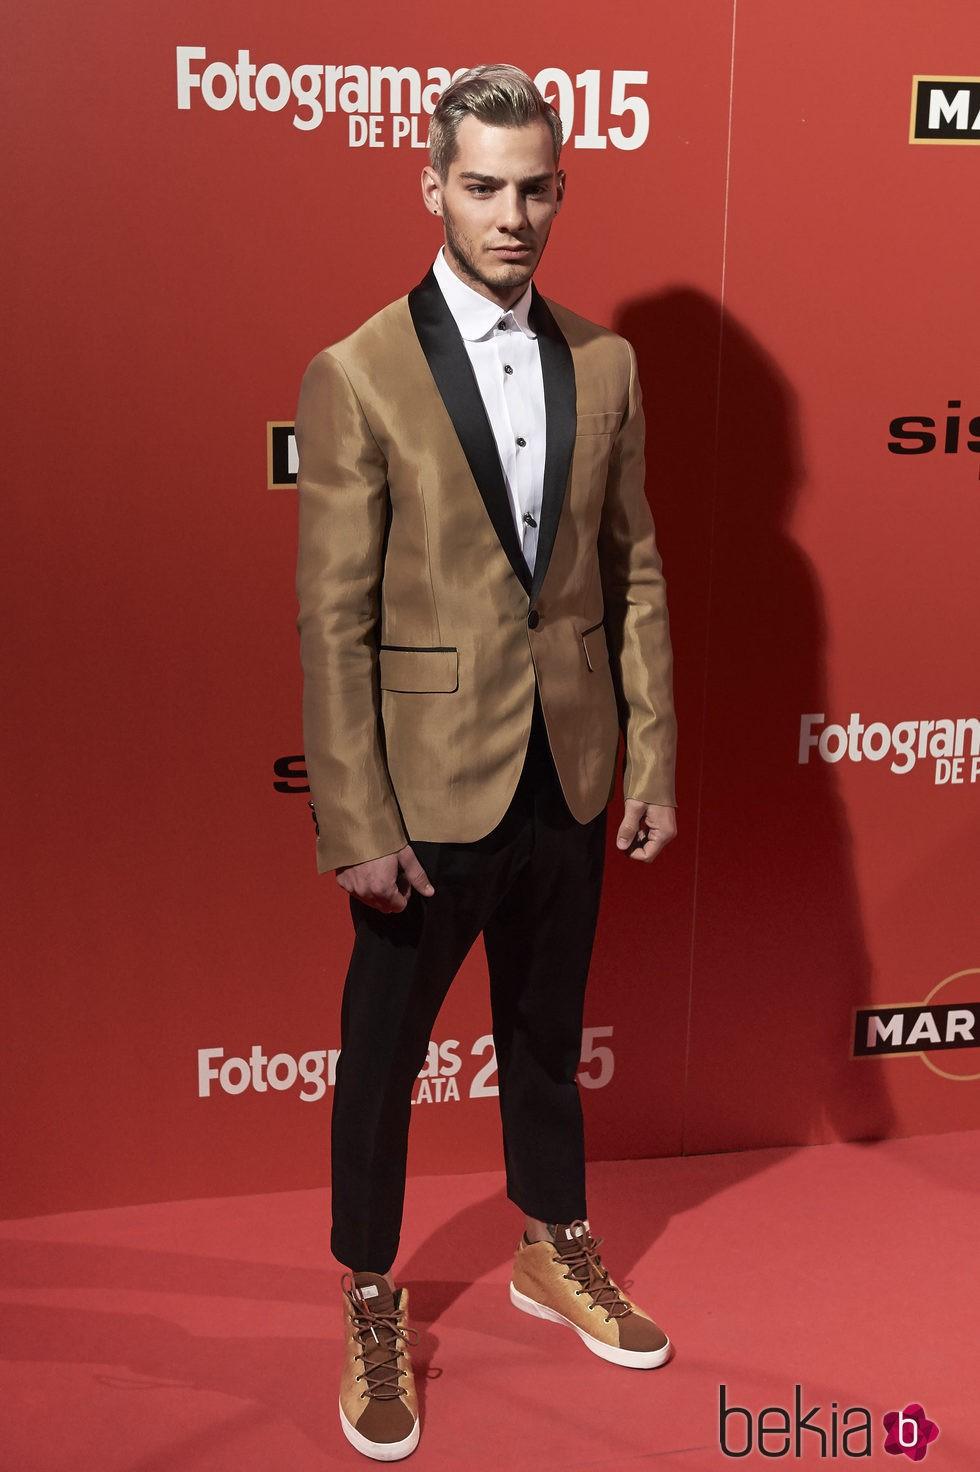 Joel Bosqued en la alfombra roja de los Fotogramas de Plata 2015